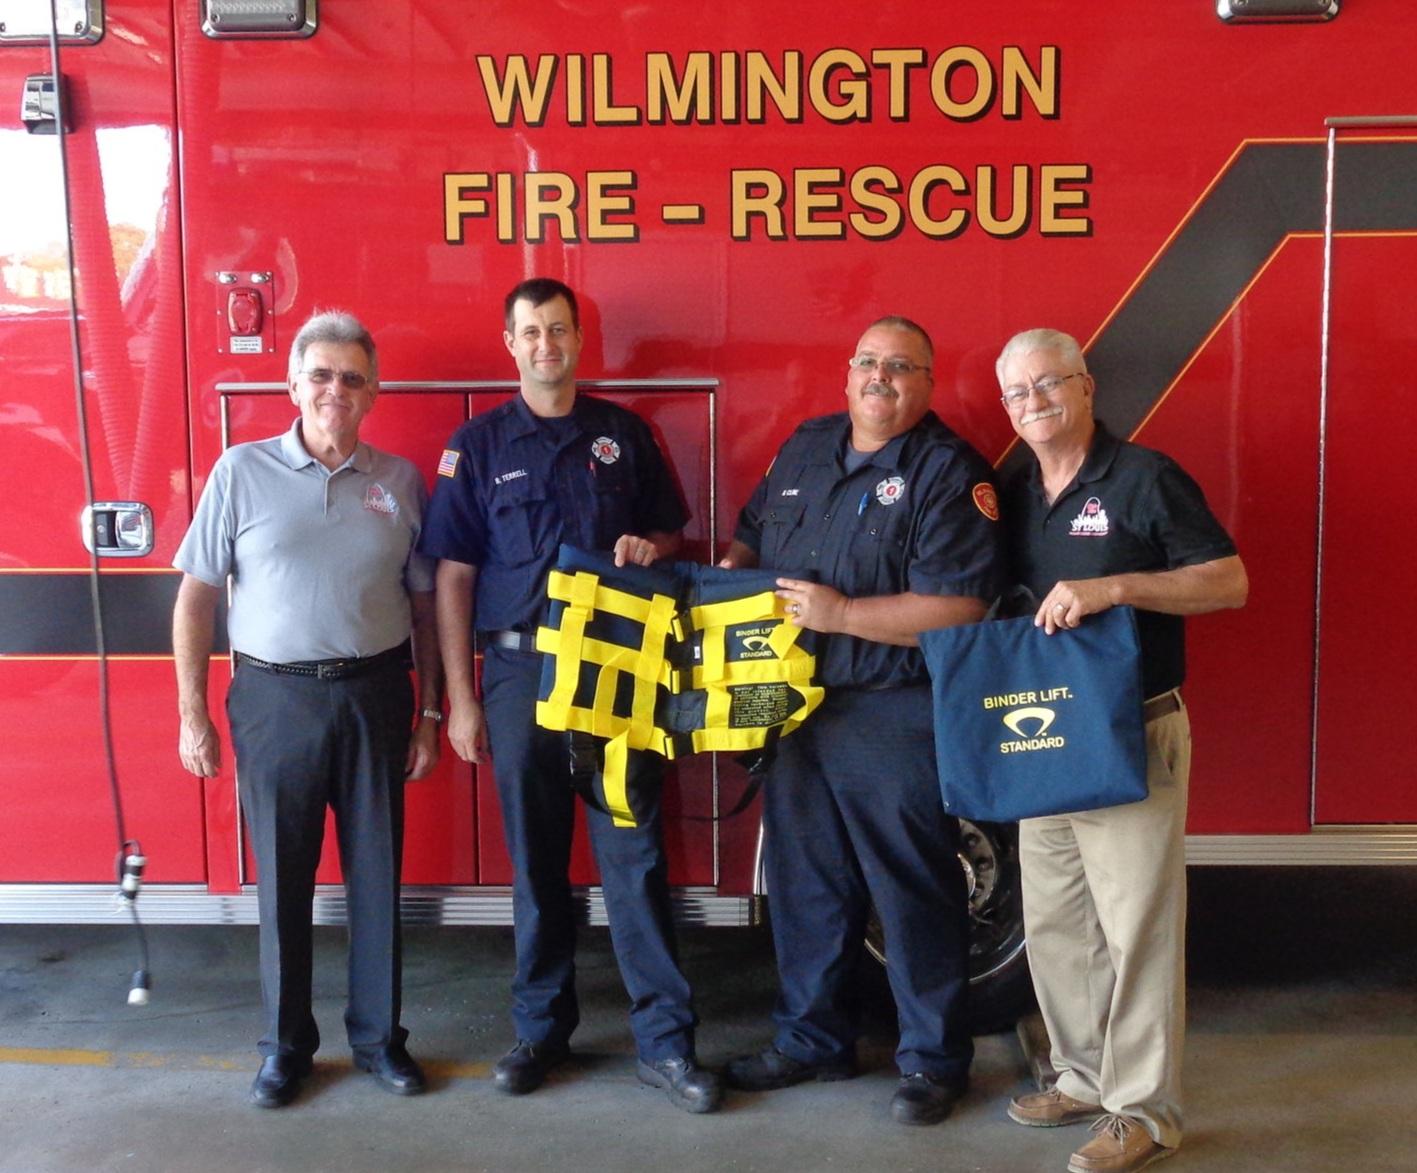 Pictured from left: ER, Dave Appleman, EMT Terrell, EMT Cline, and PER, Dan Williams.